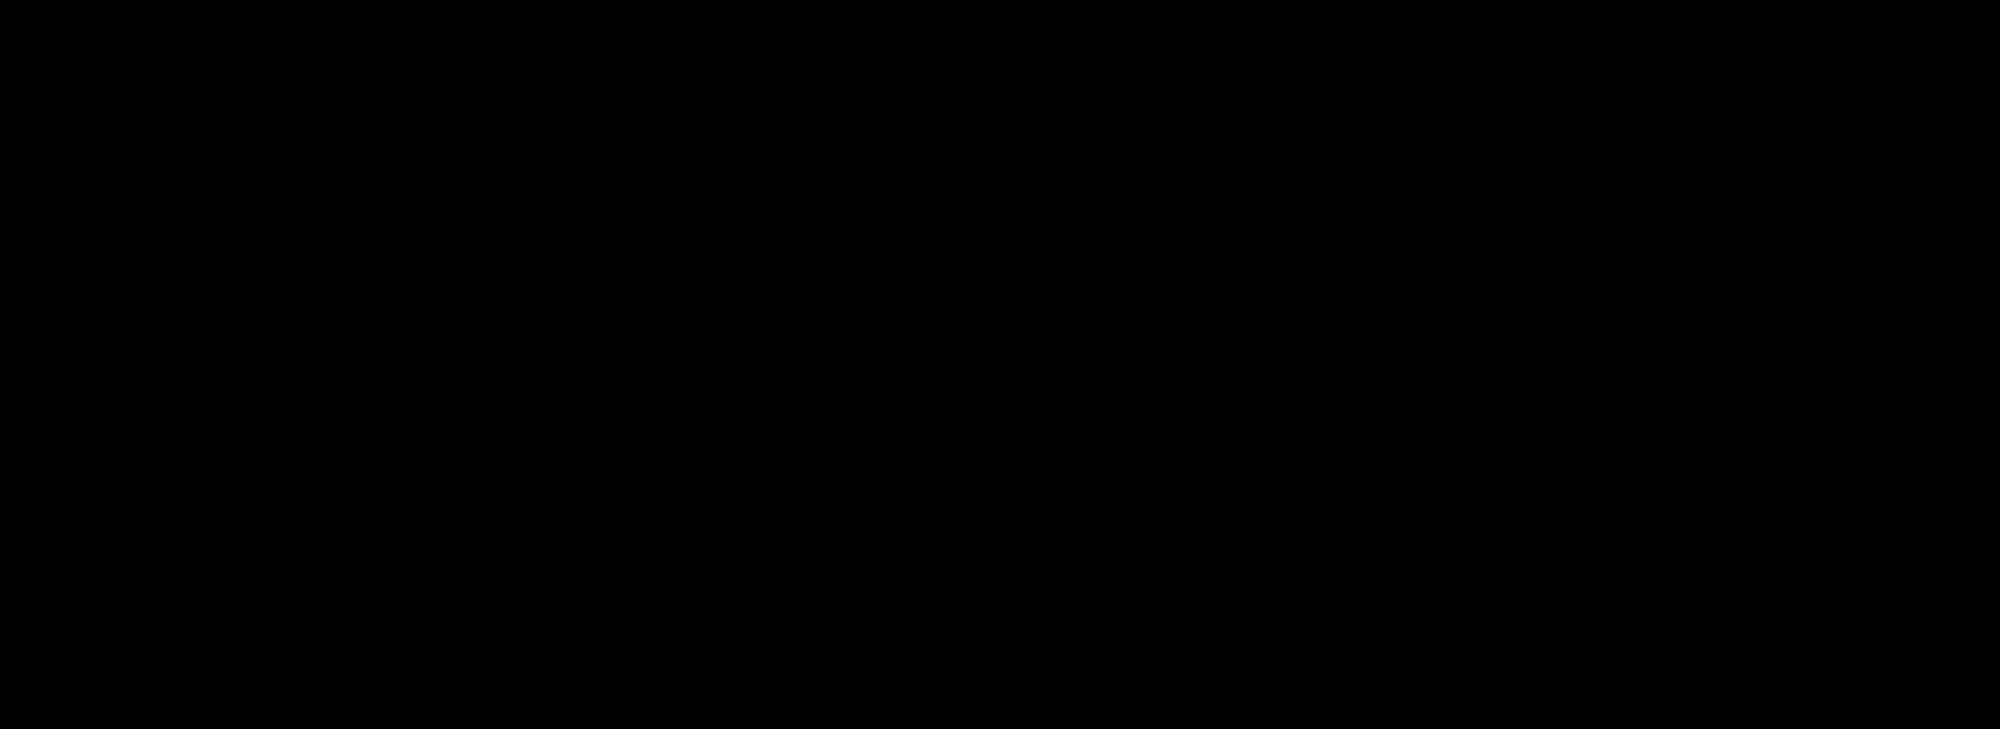 GLOBALLOCALTRAVELER-logo-black (1).png